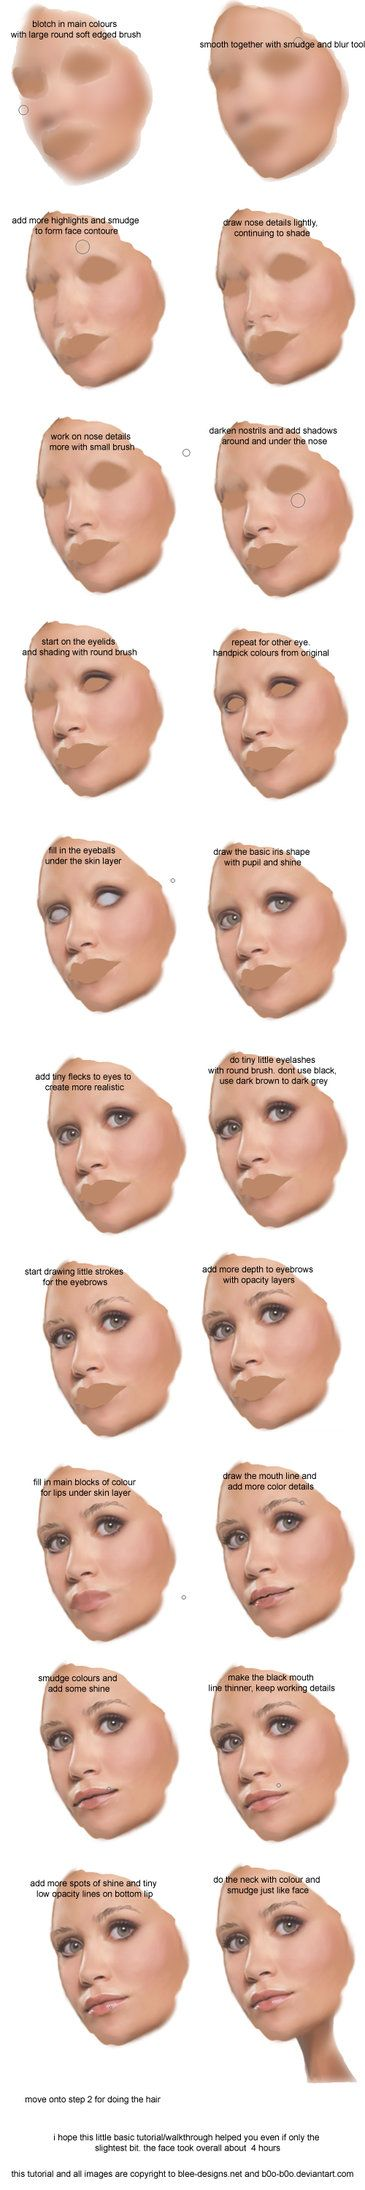 Digital Painting tutorial pt 1 by ~b0o-b0o on deviantART